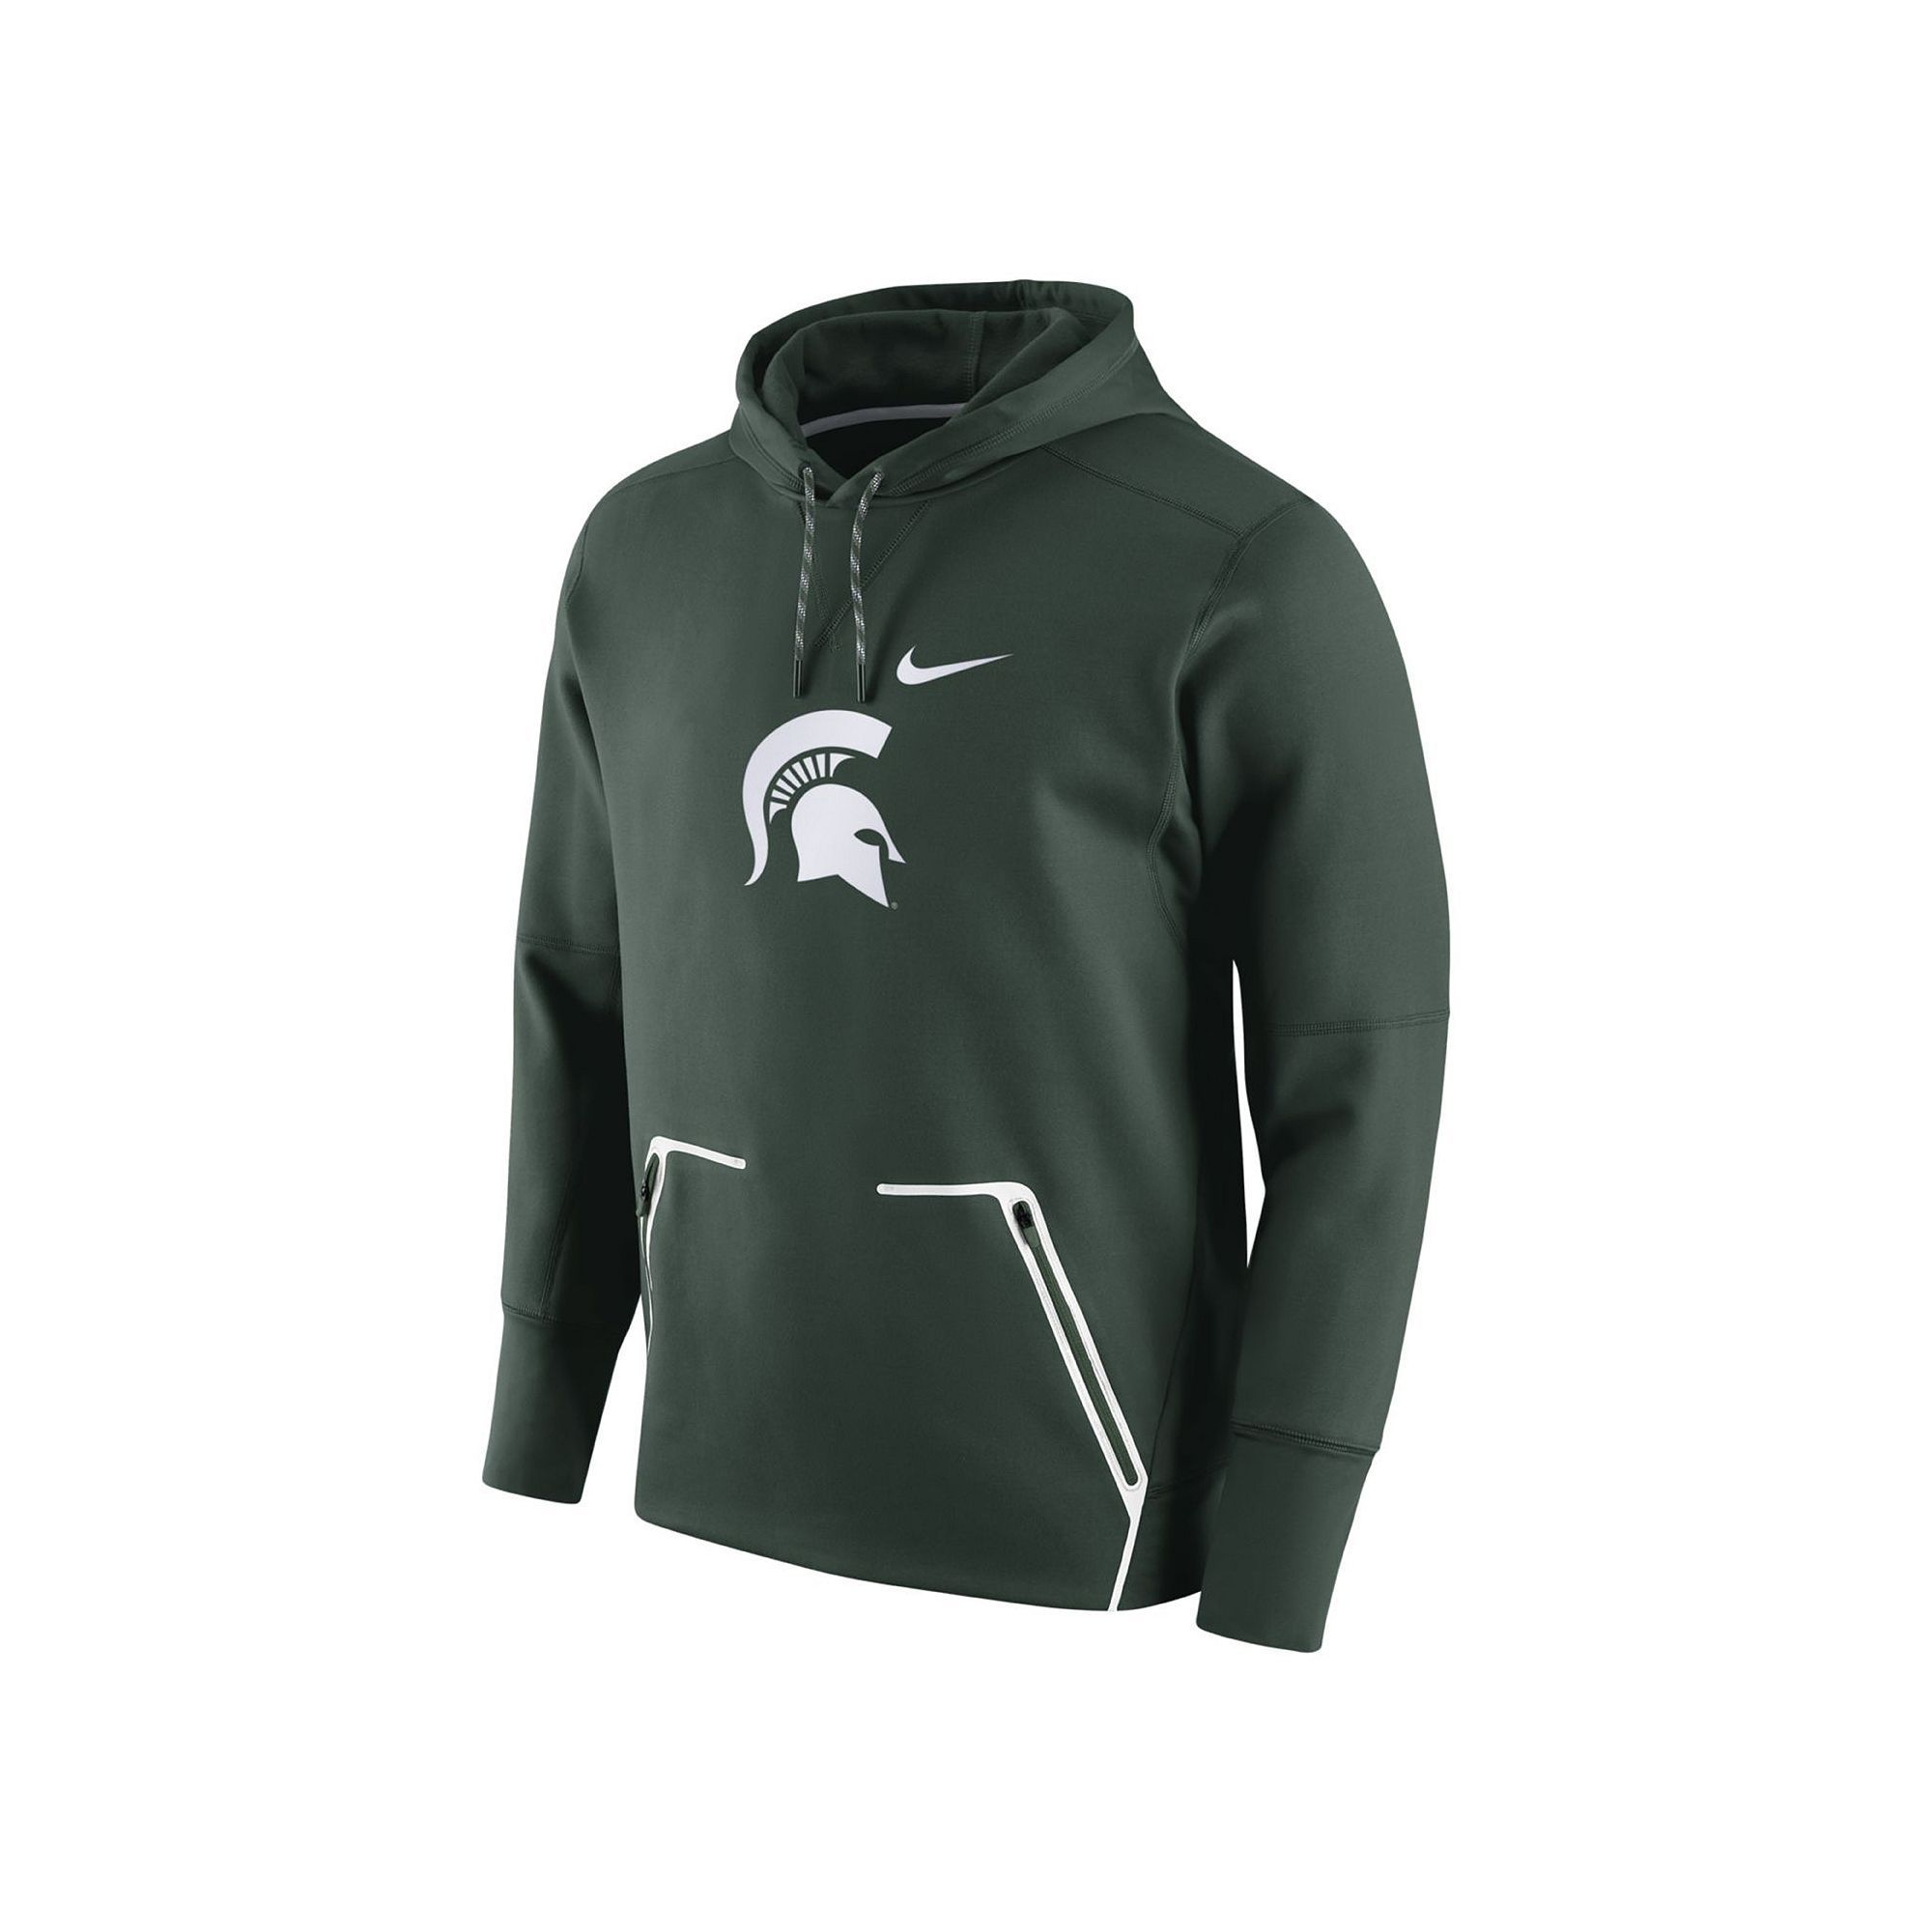 70c06efe938 Men s Nike Michigan State Spartans Vapor Speed Fleece Hoodie